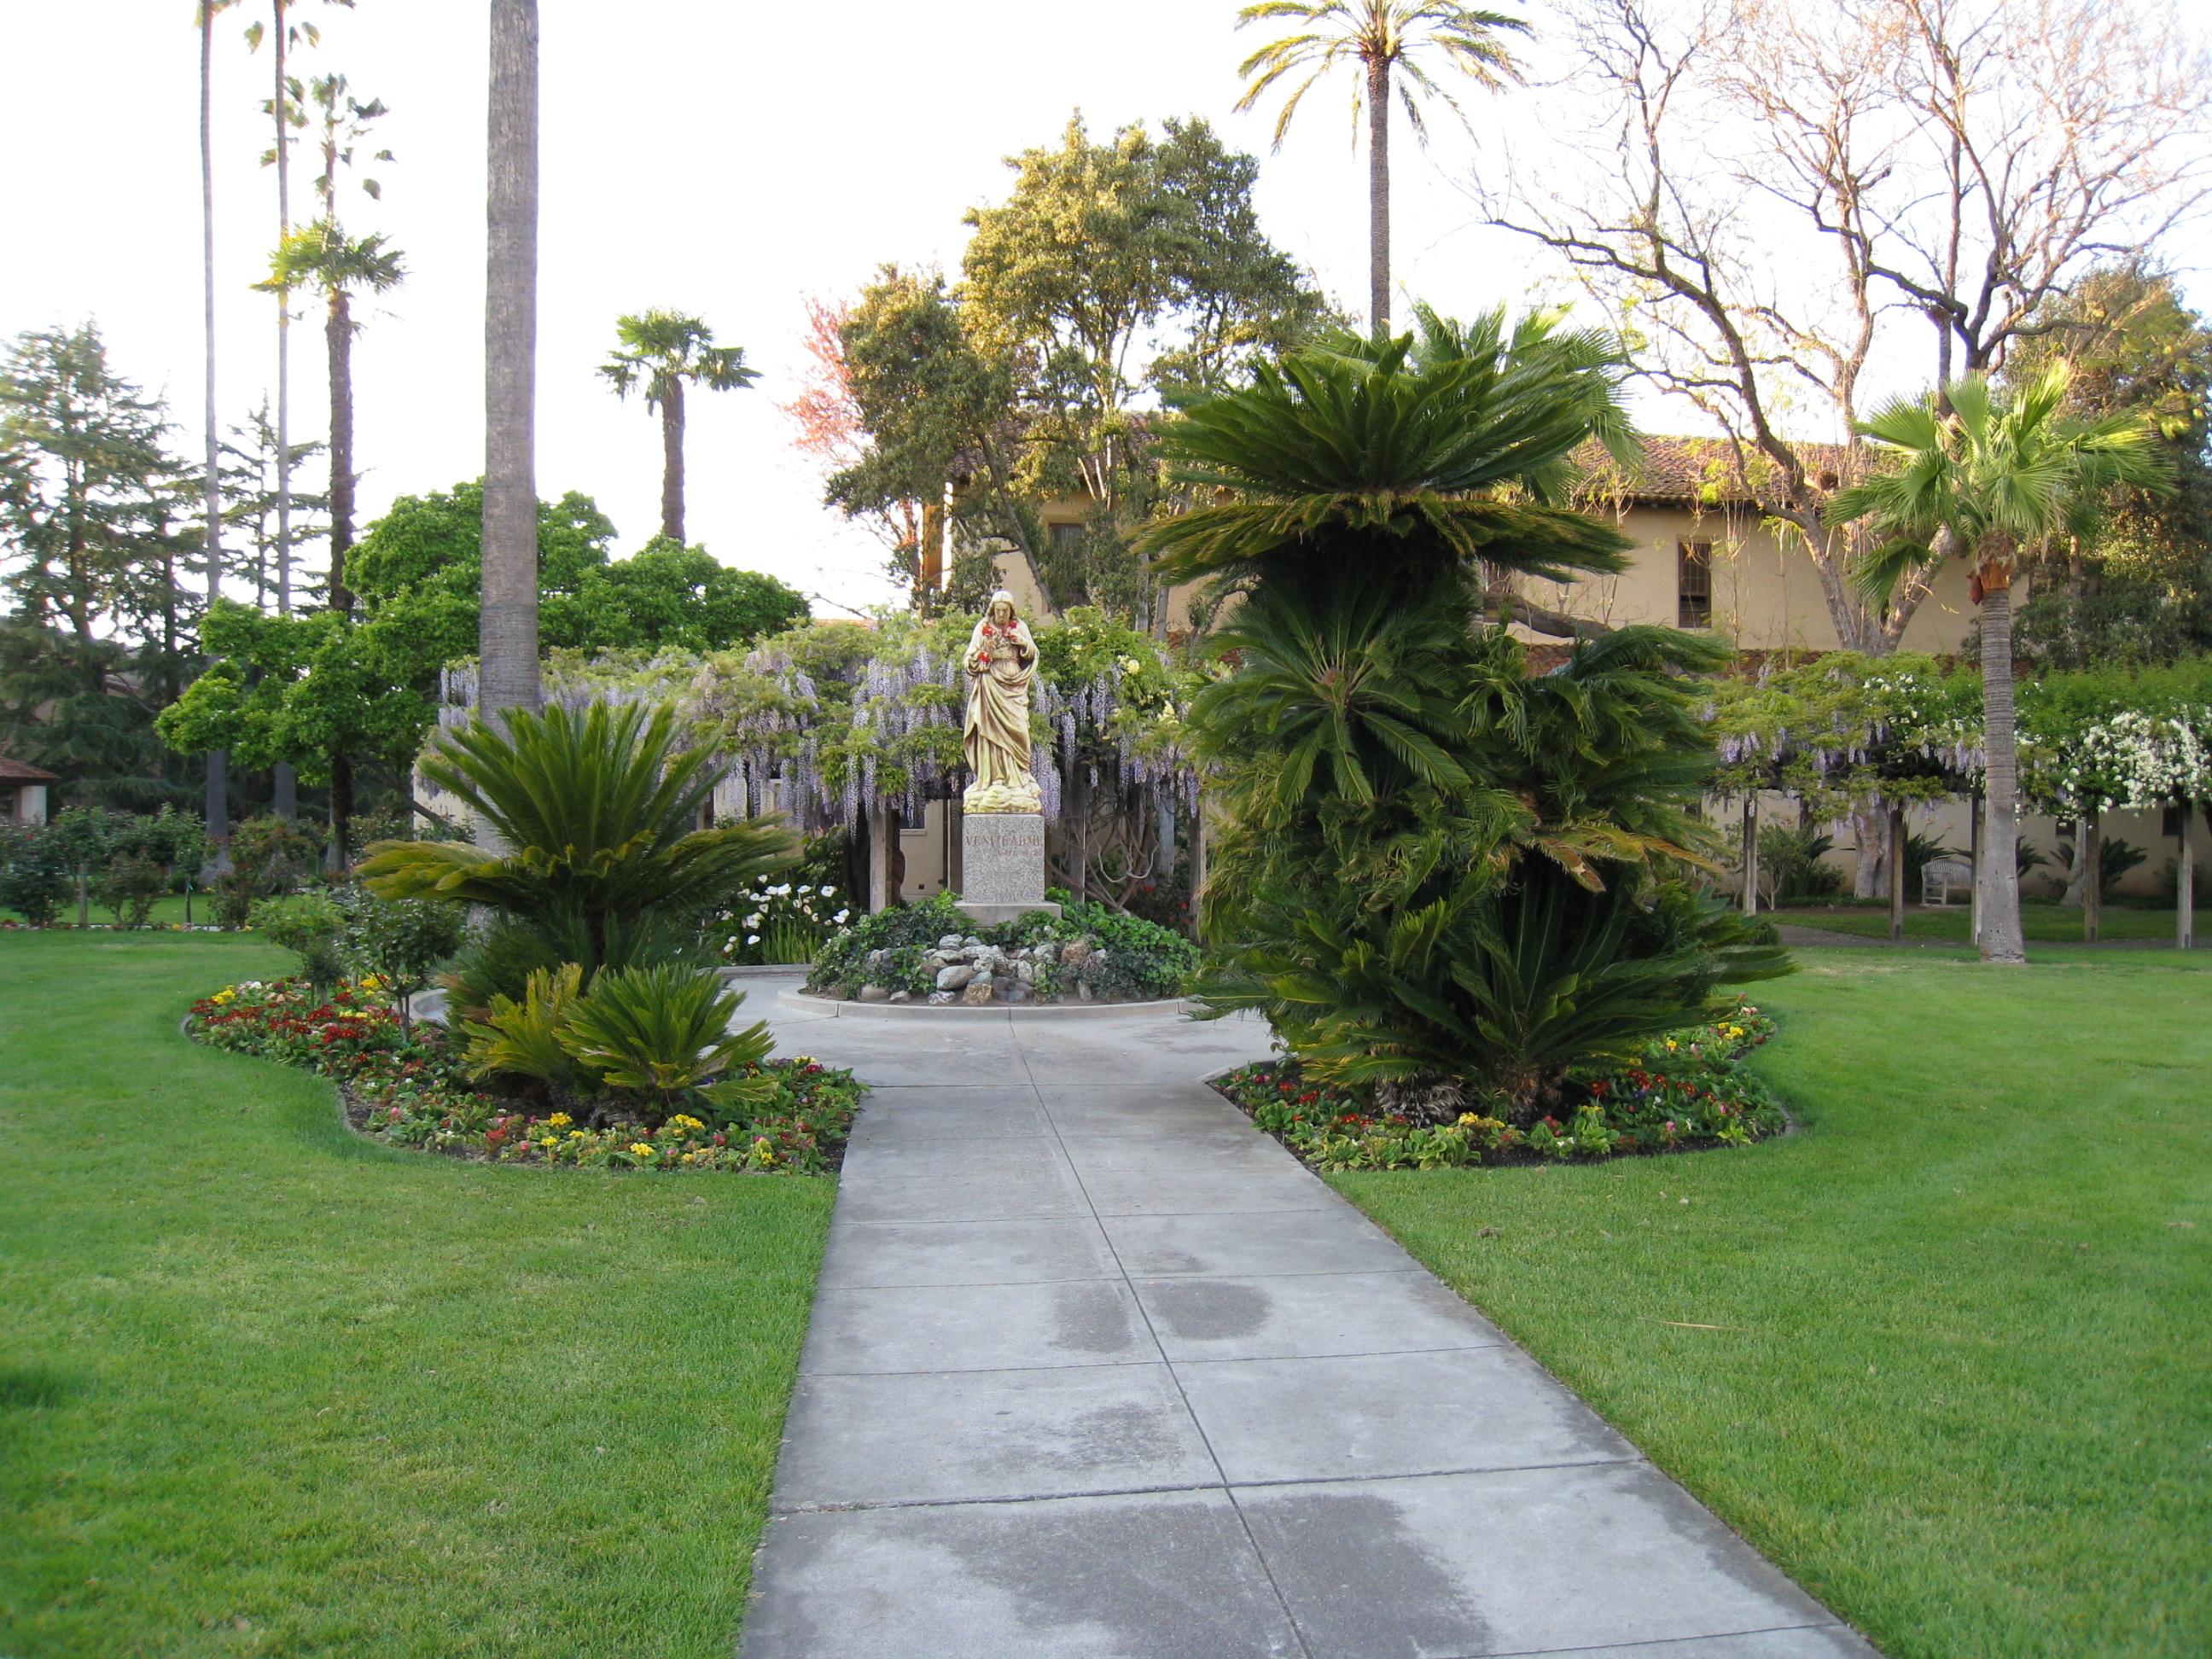 File:Mission Santa Clara Gardens 1